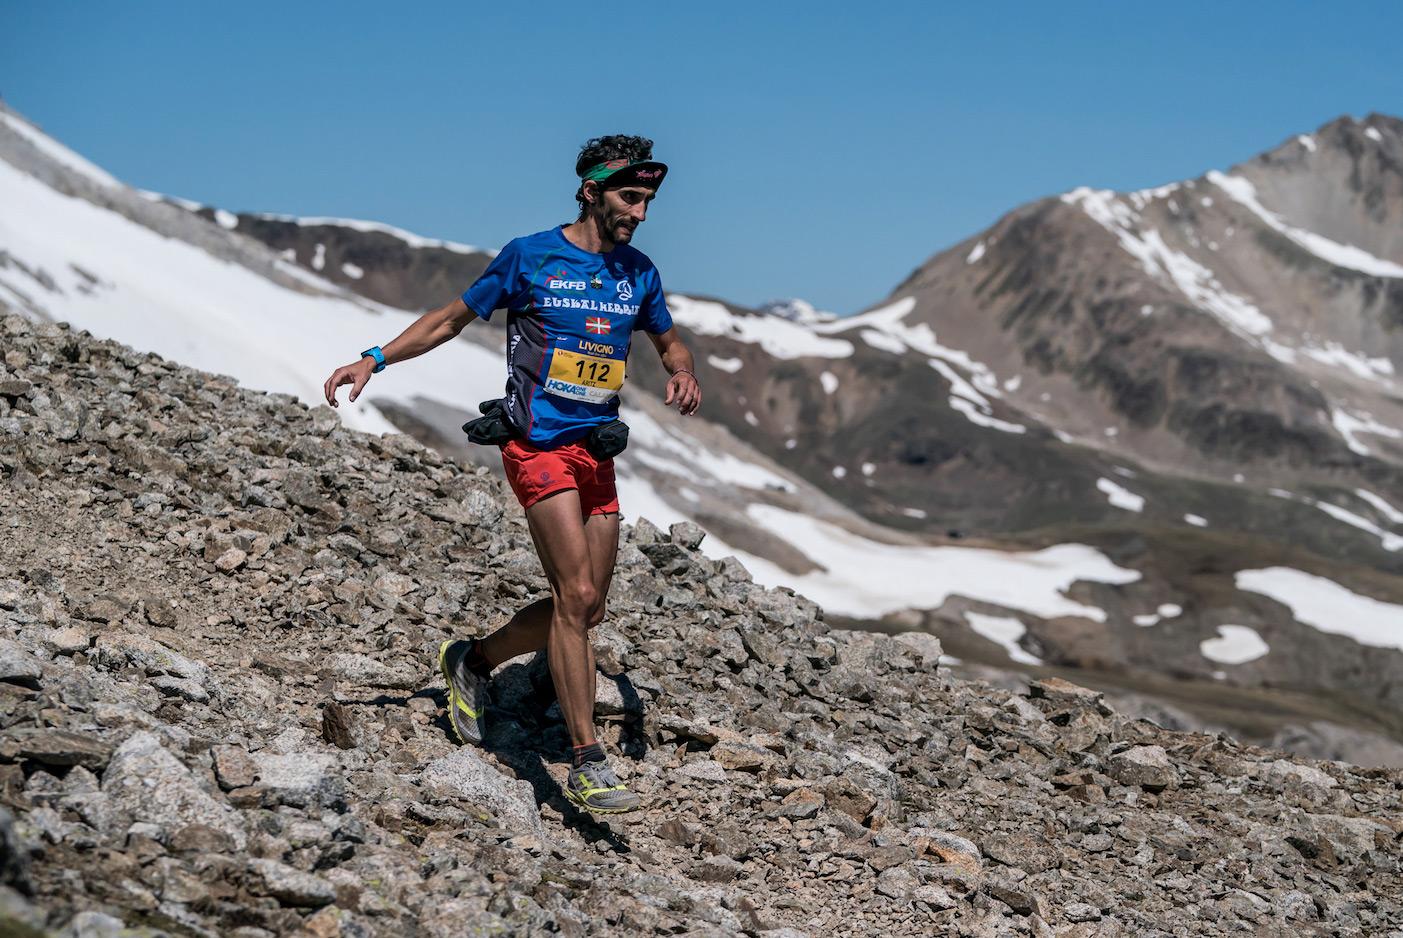 Aritz Egea, 2nd in the Livigno SkyMarathon, now leads the Sky Classic ranking. ©iancorless.com /SWS